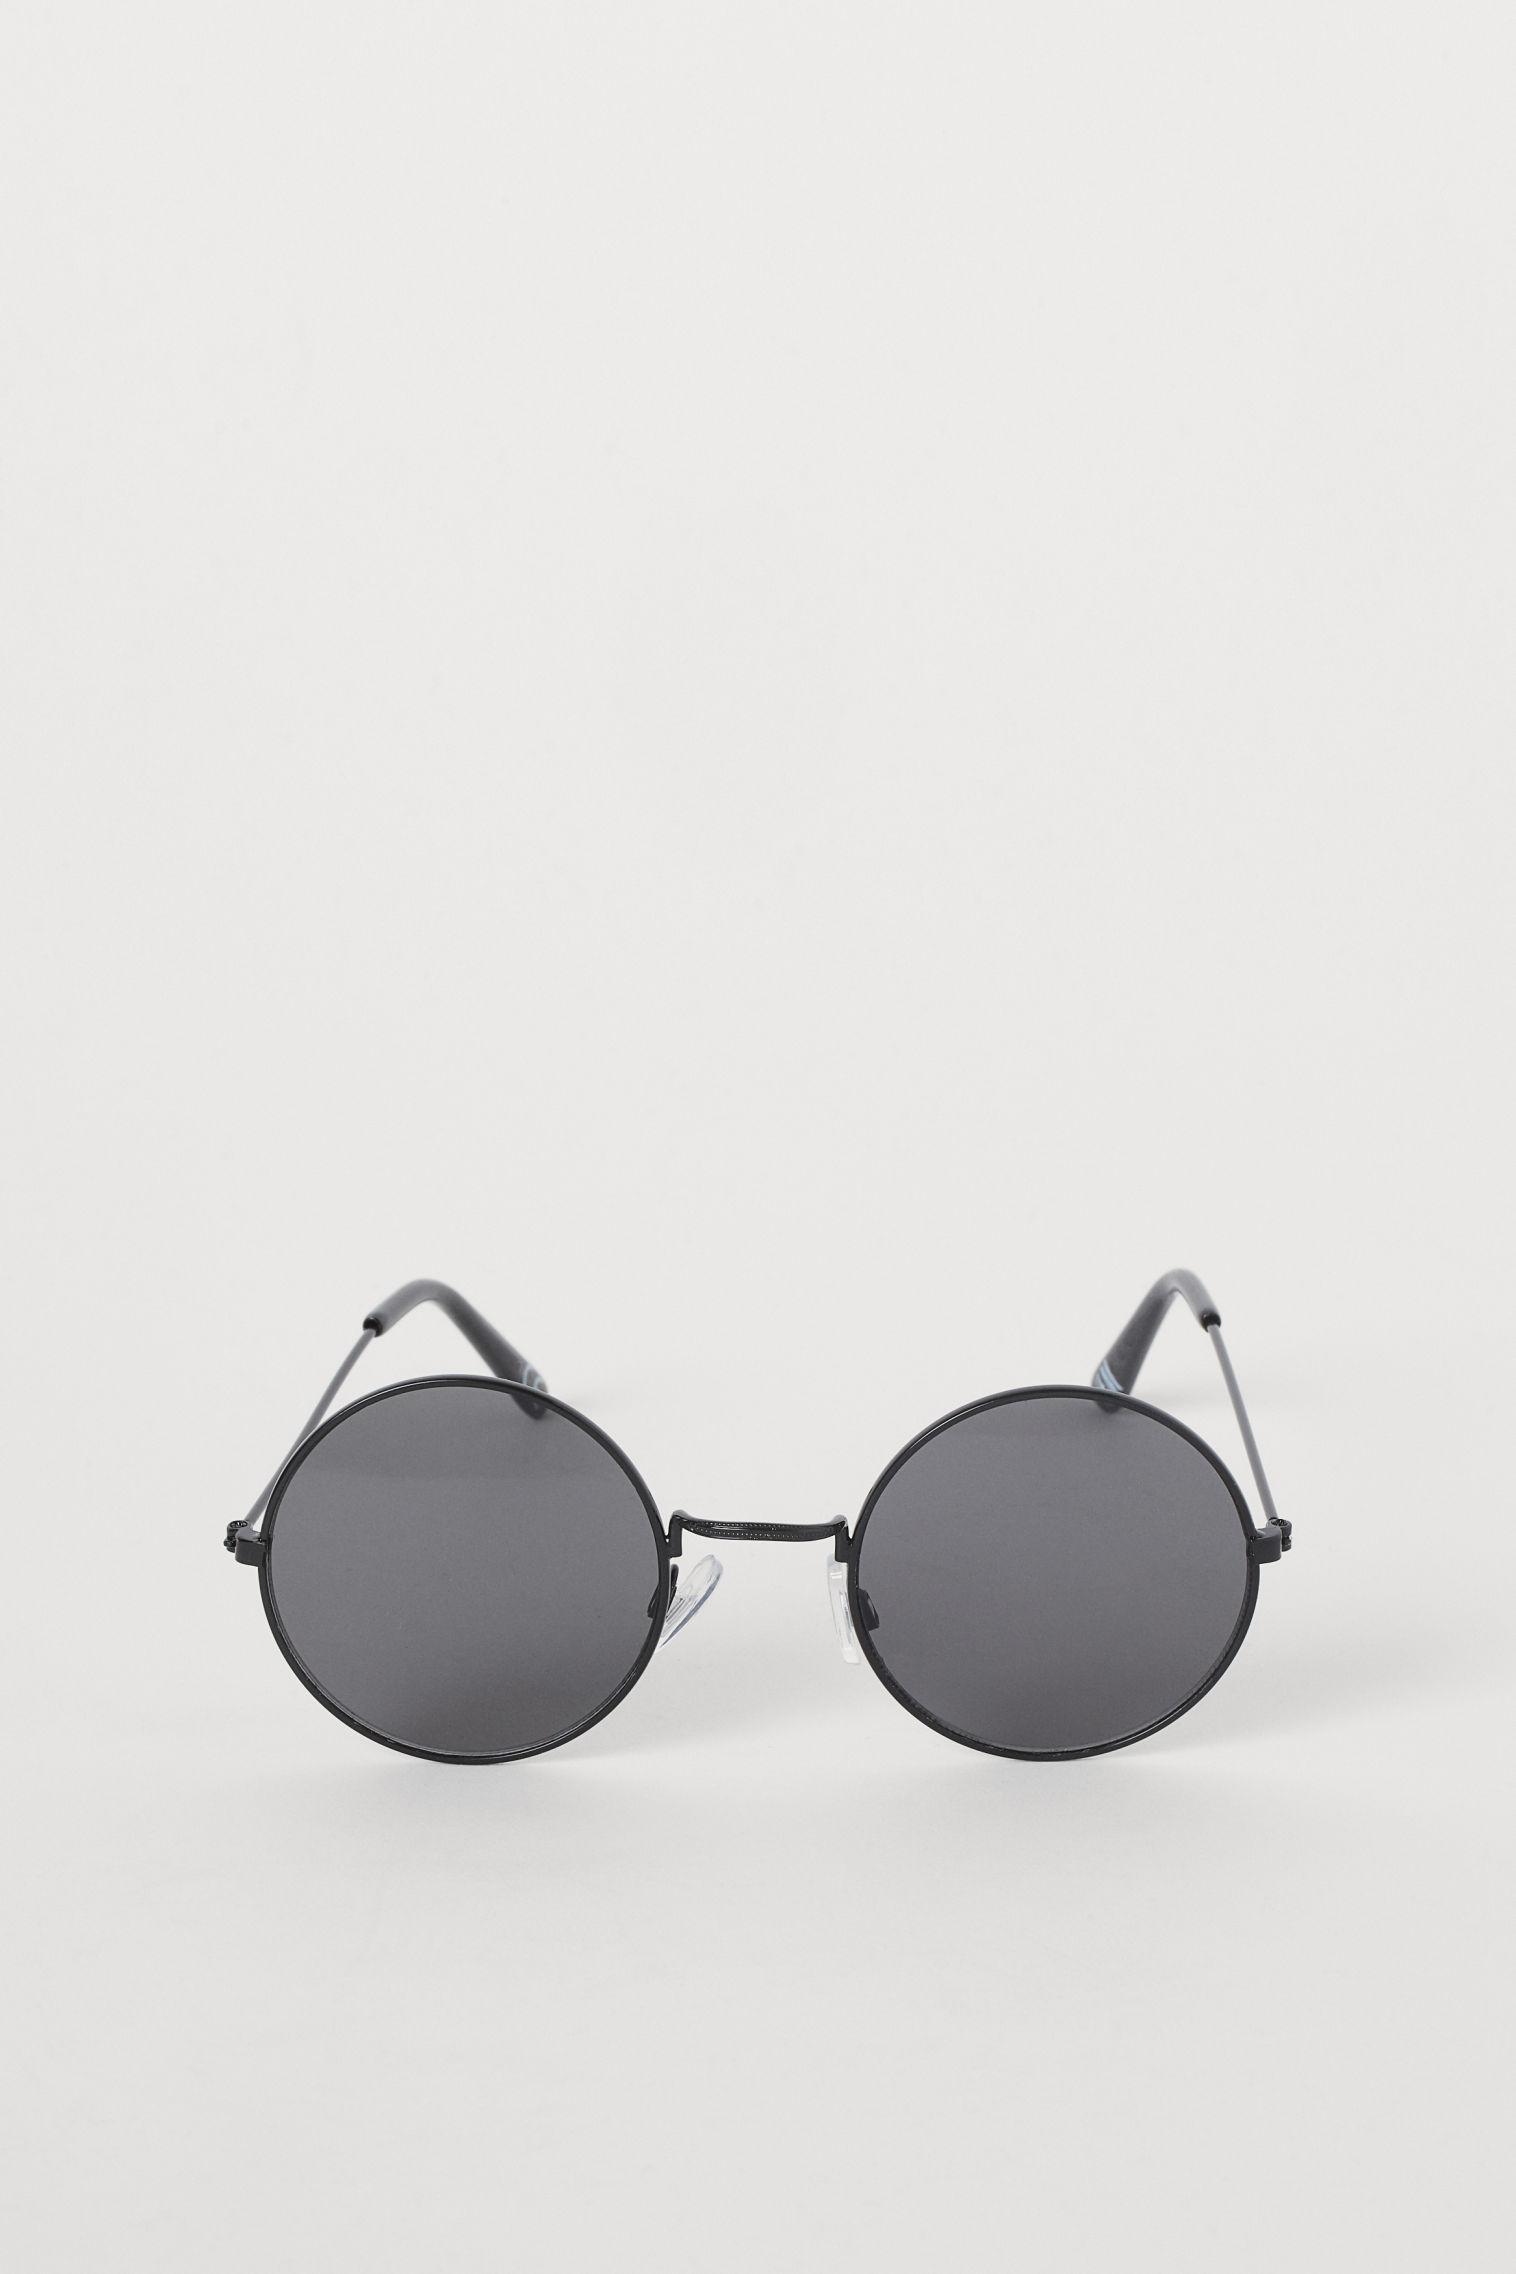 d2399eab00eff Round sunglasses  Round sunglasses